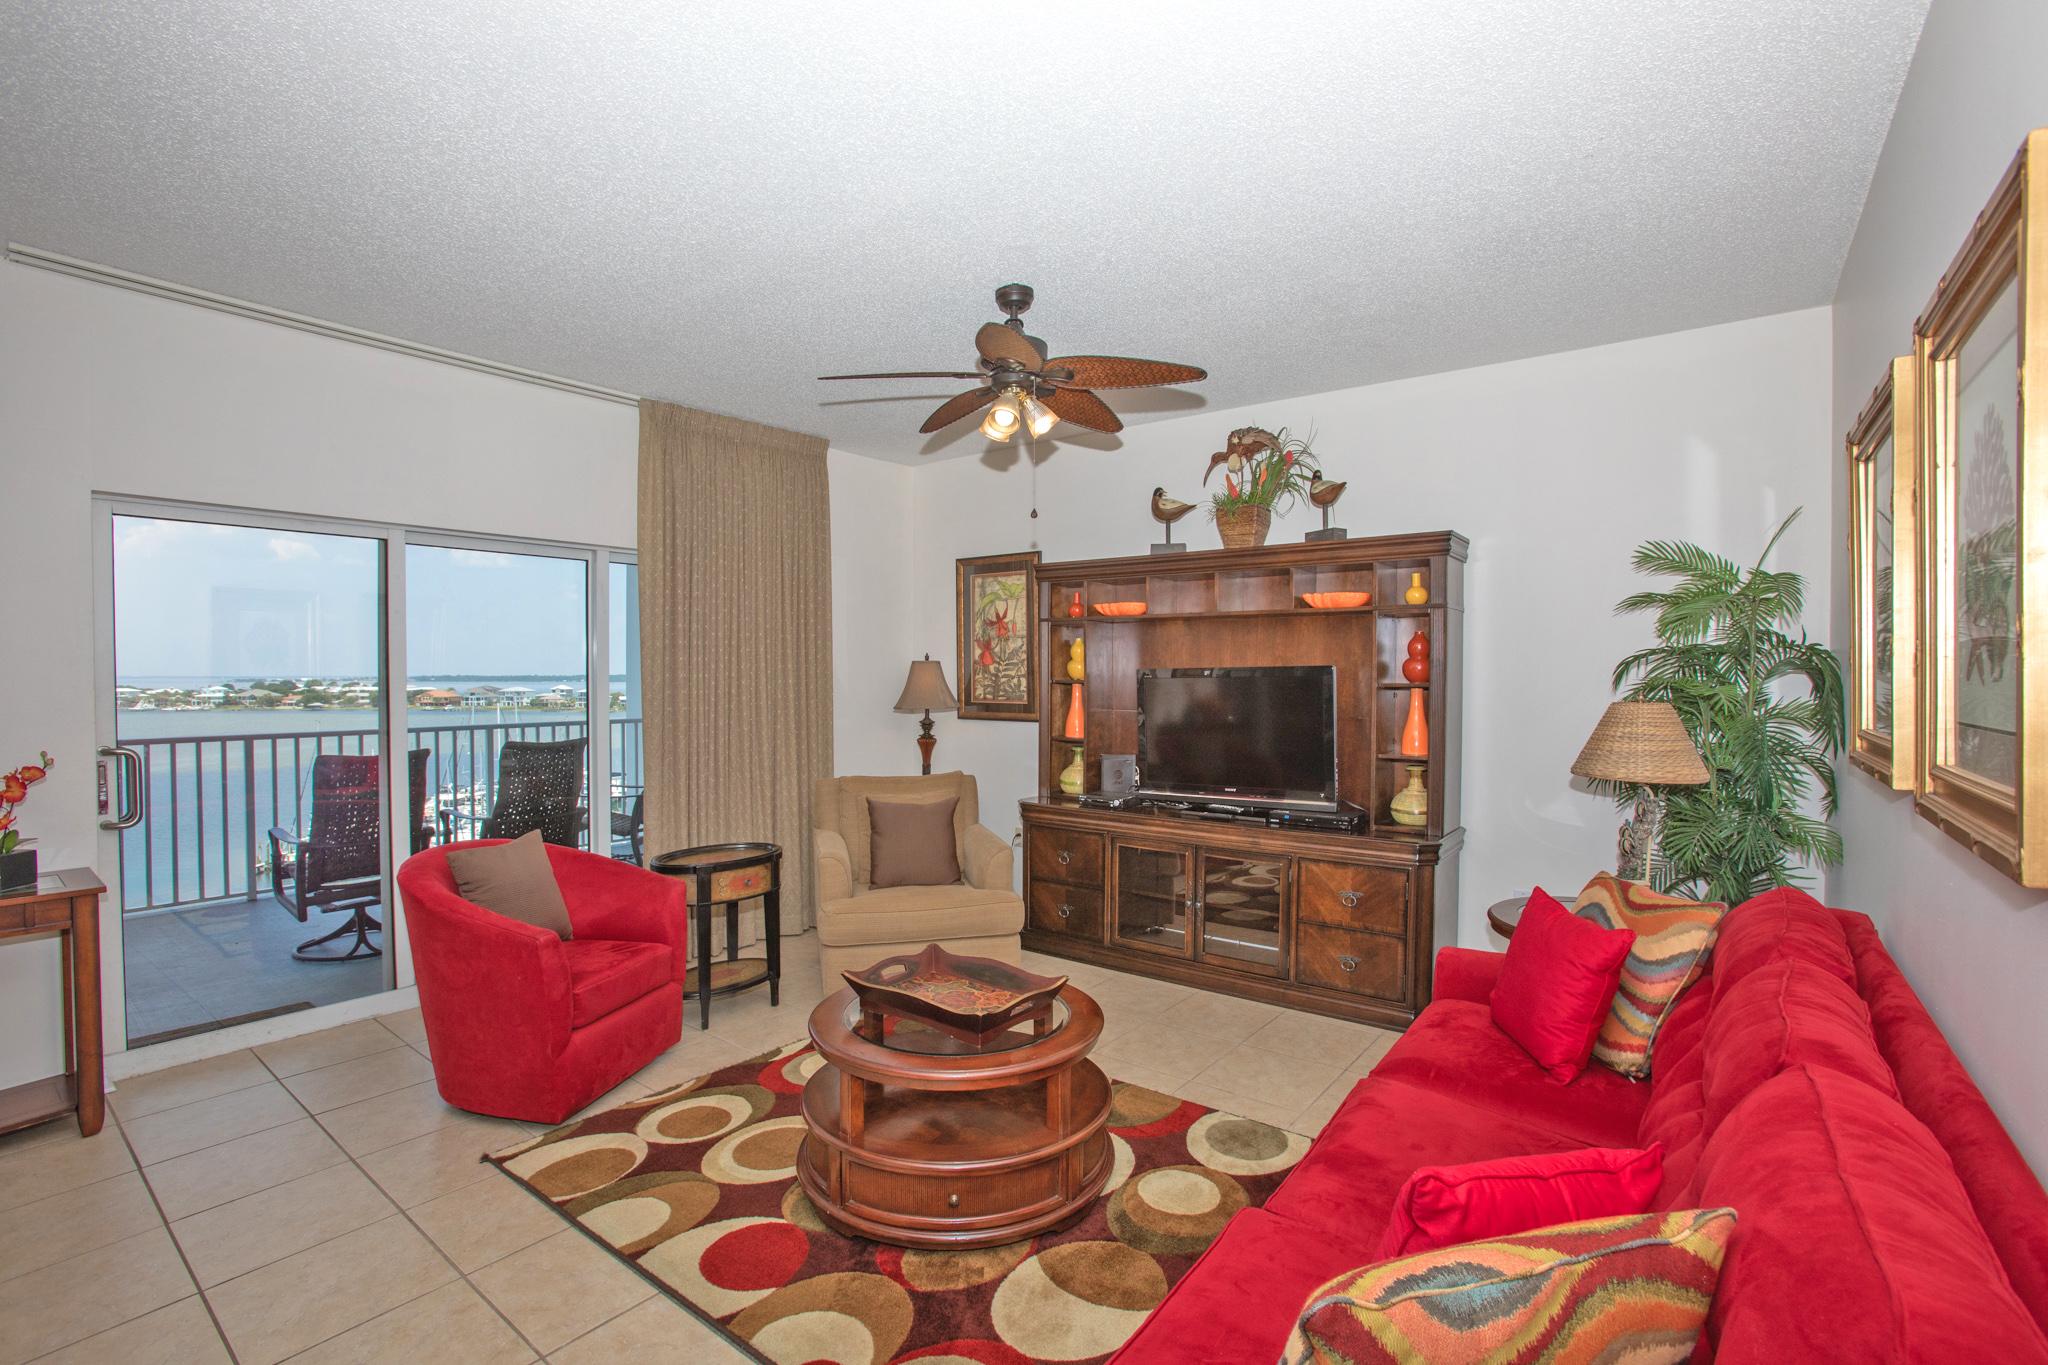 South Harbour #7E Condo rental in South Harbour ~ Pensacola Beach Vacation Rentals by BeachGuide in Pensacola Beach Florida - #14